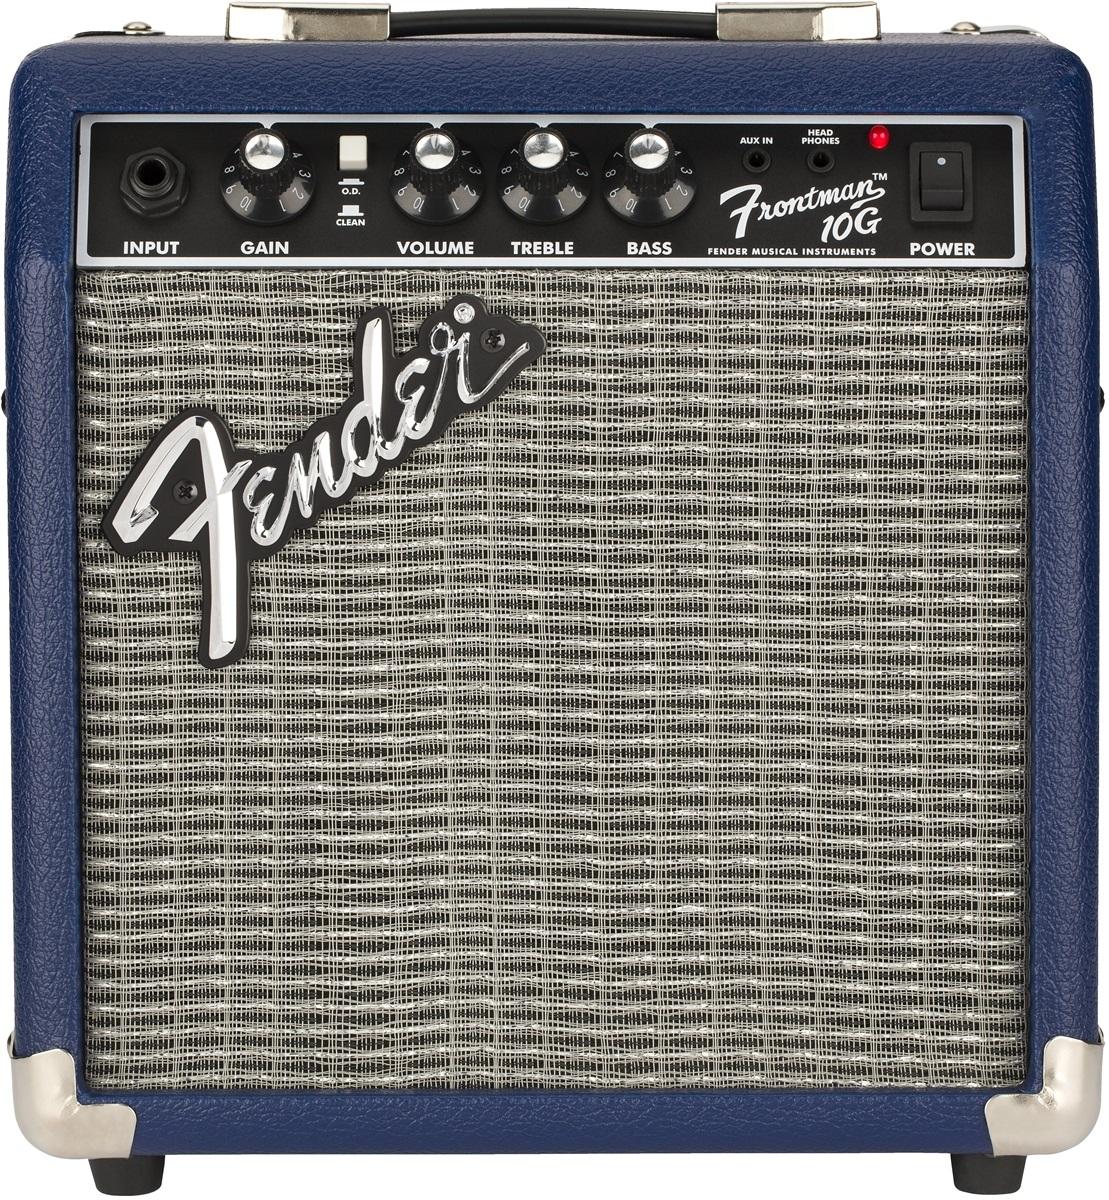 Fender Frontman 10G Blue